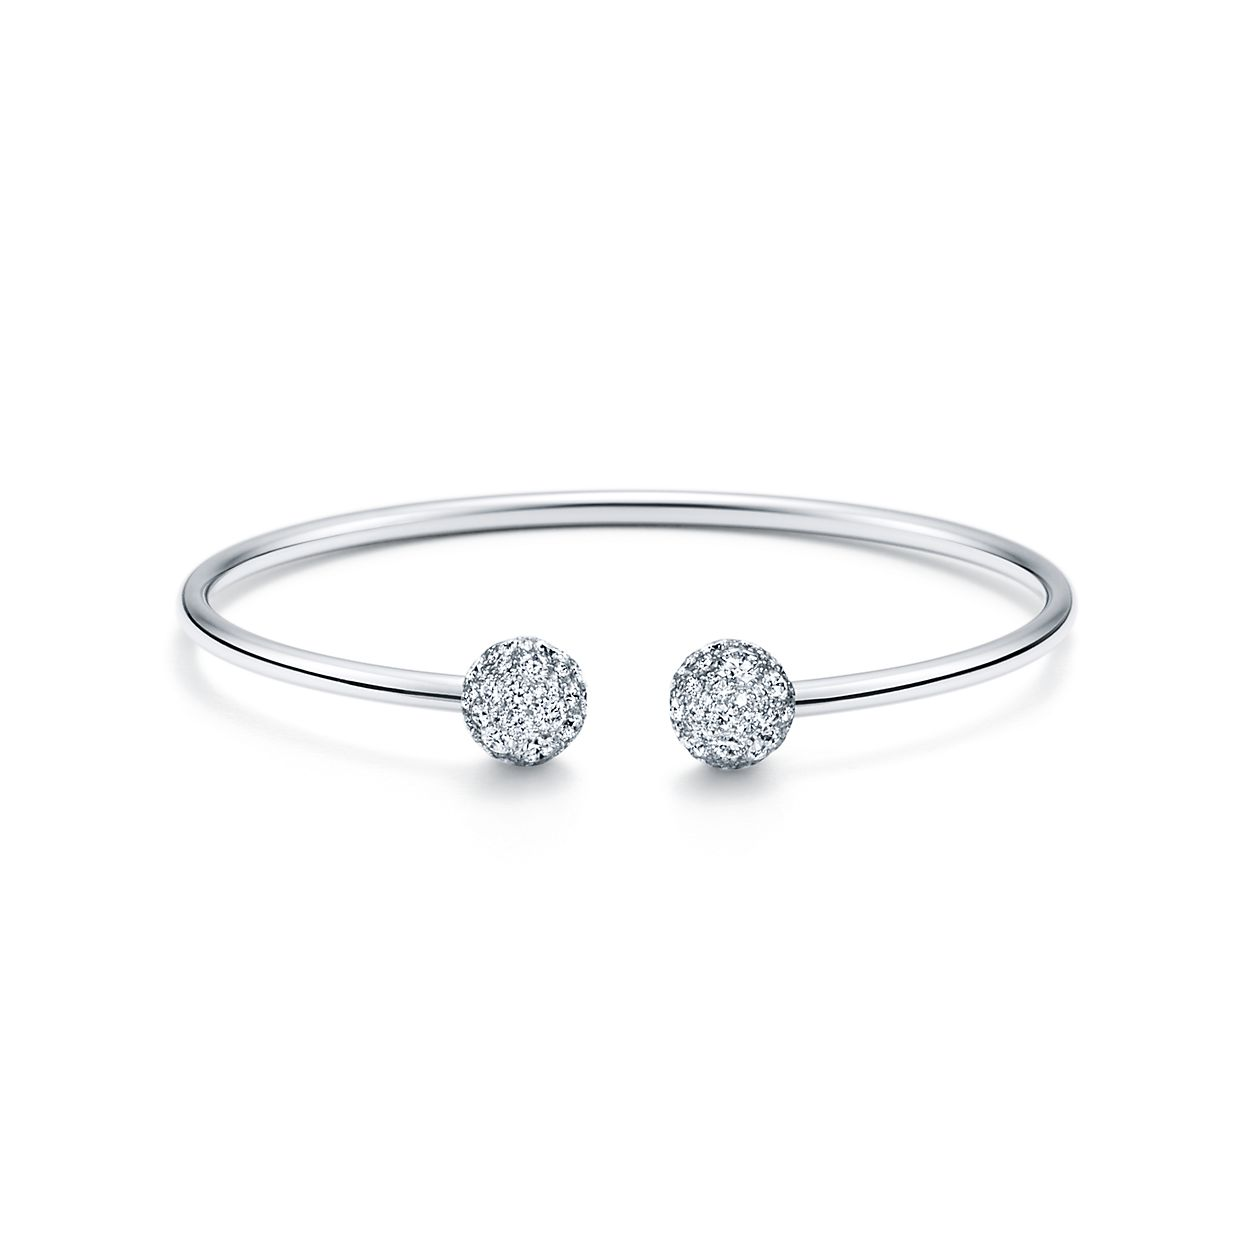 Tiffany HardWear ball wire bracelet in 18k white gold with diamonds ...